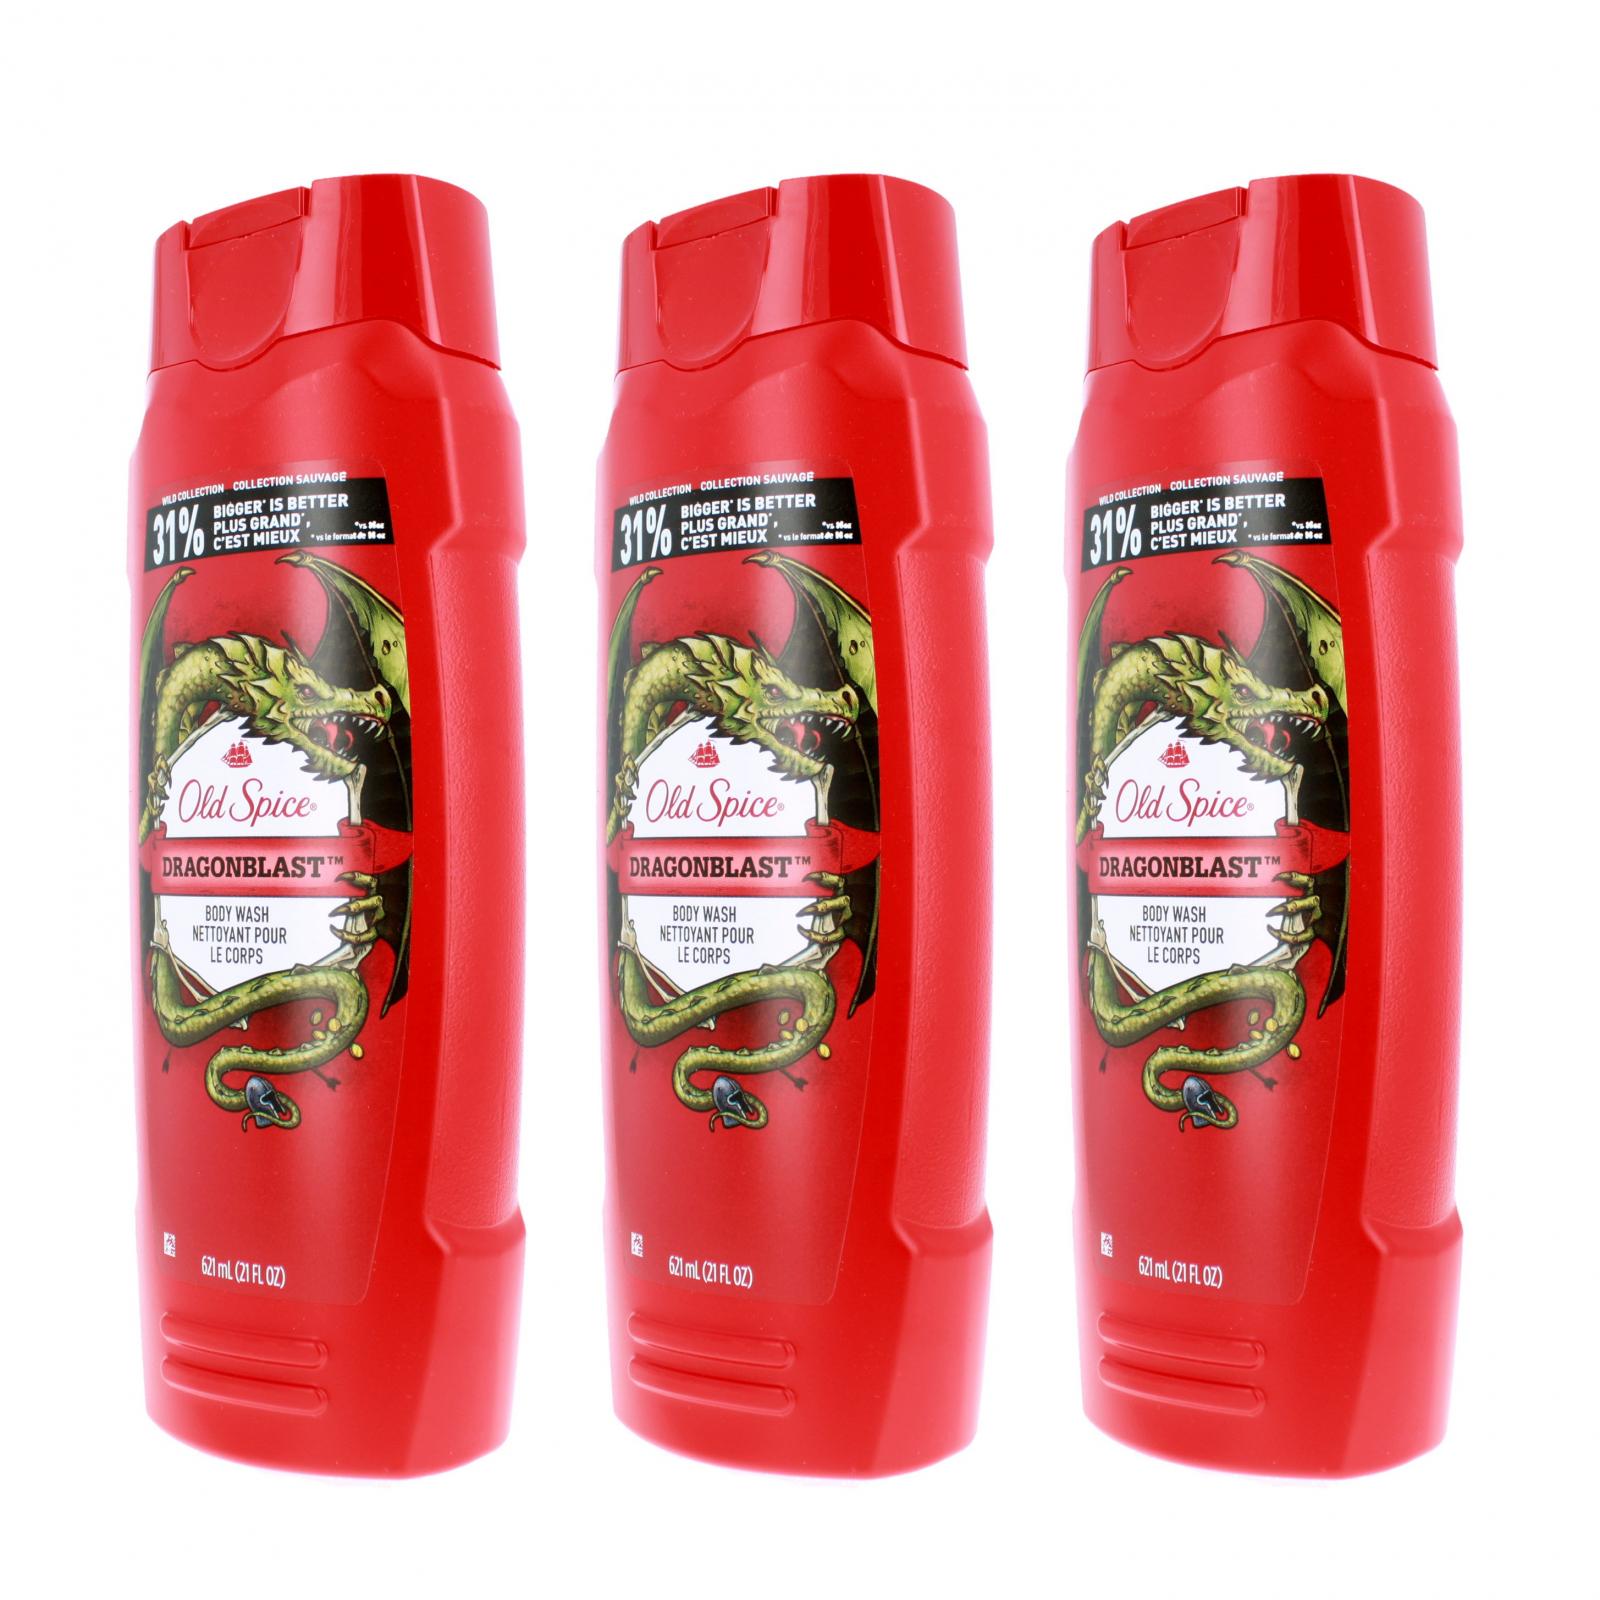 Old Spice Dragonblast Scent Mens Body Wash Shower Gel 3pk